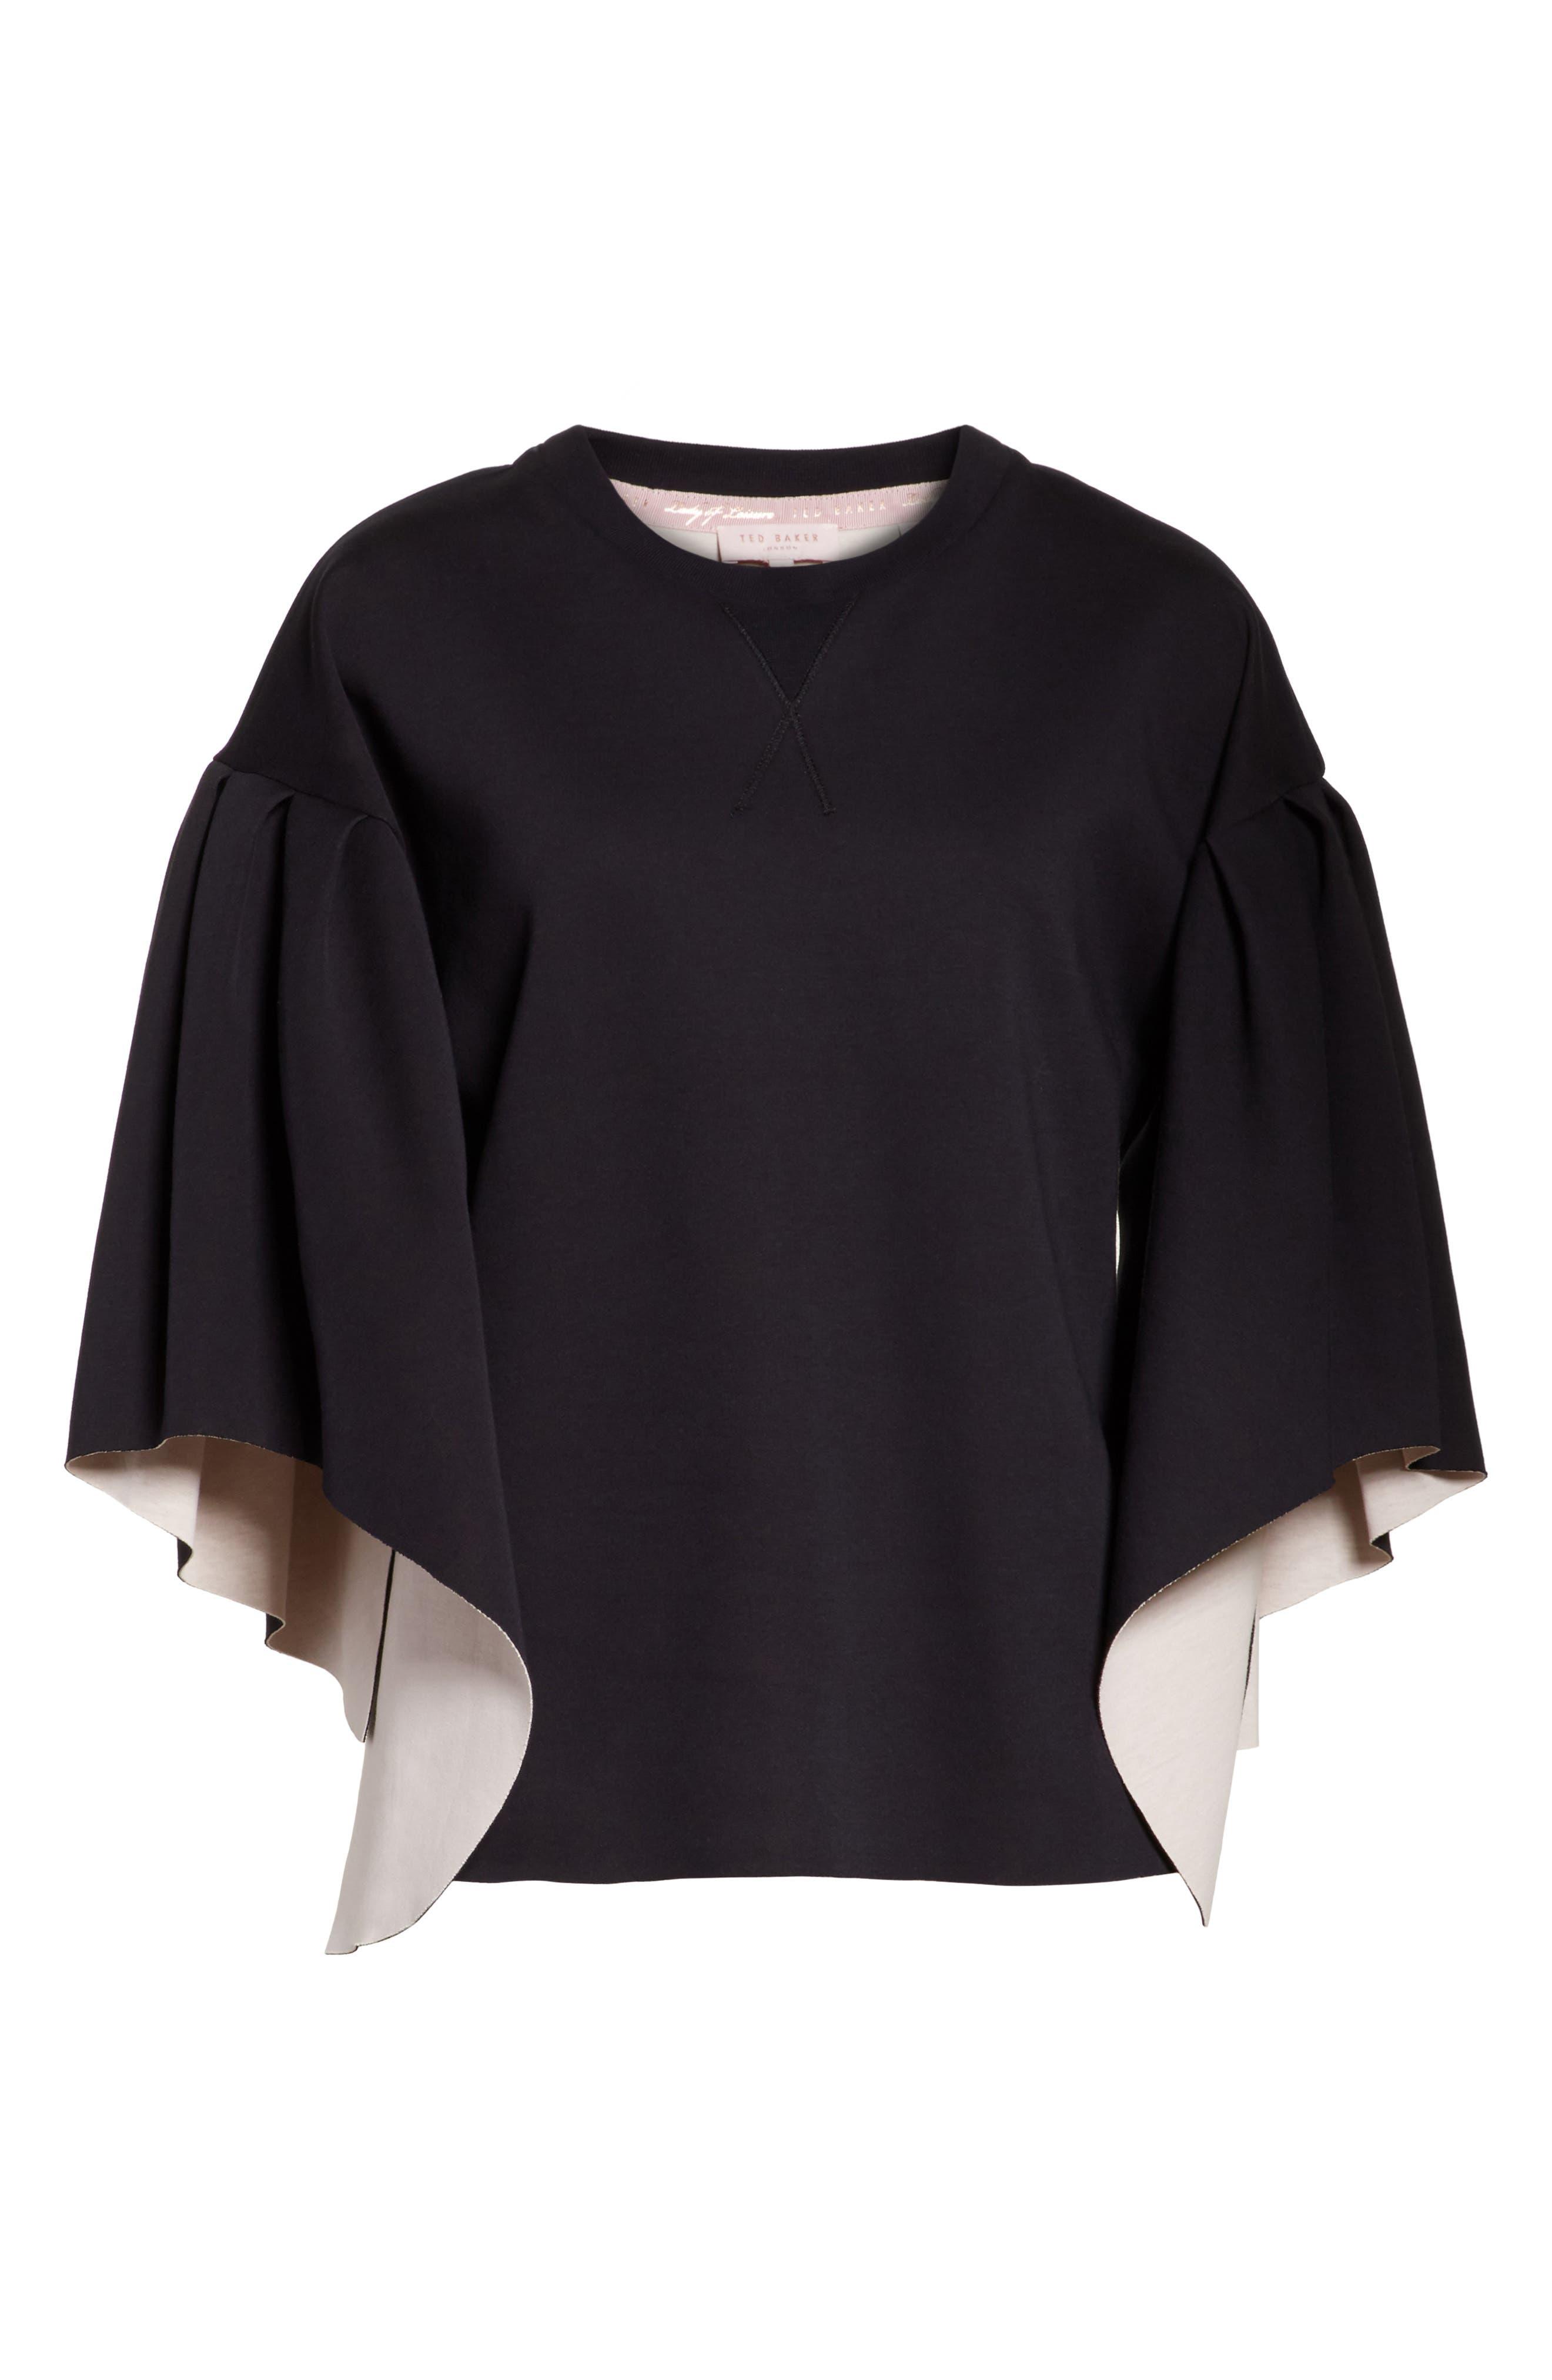 Orcher Full Sleeve Sweatshirt,                             Alternate thumbnail 6, color,                             001